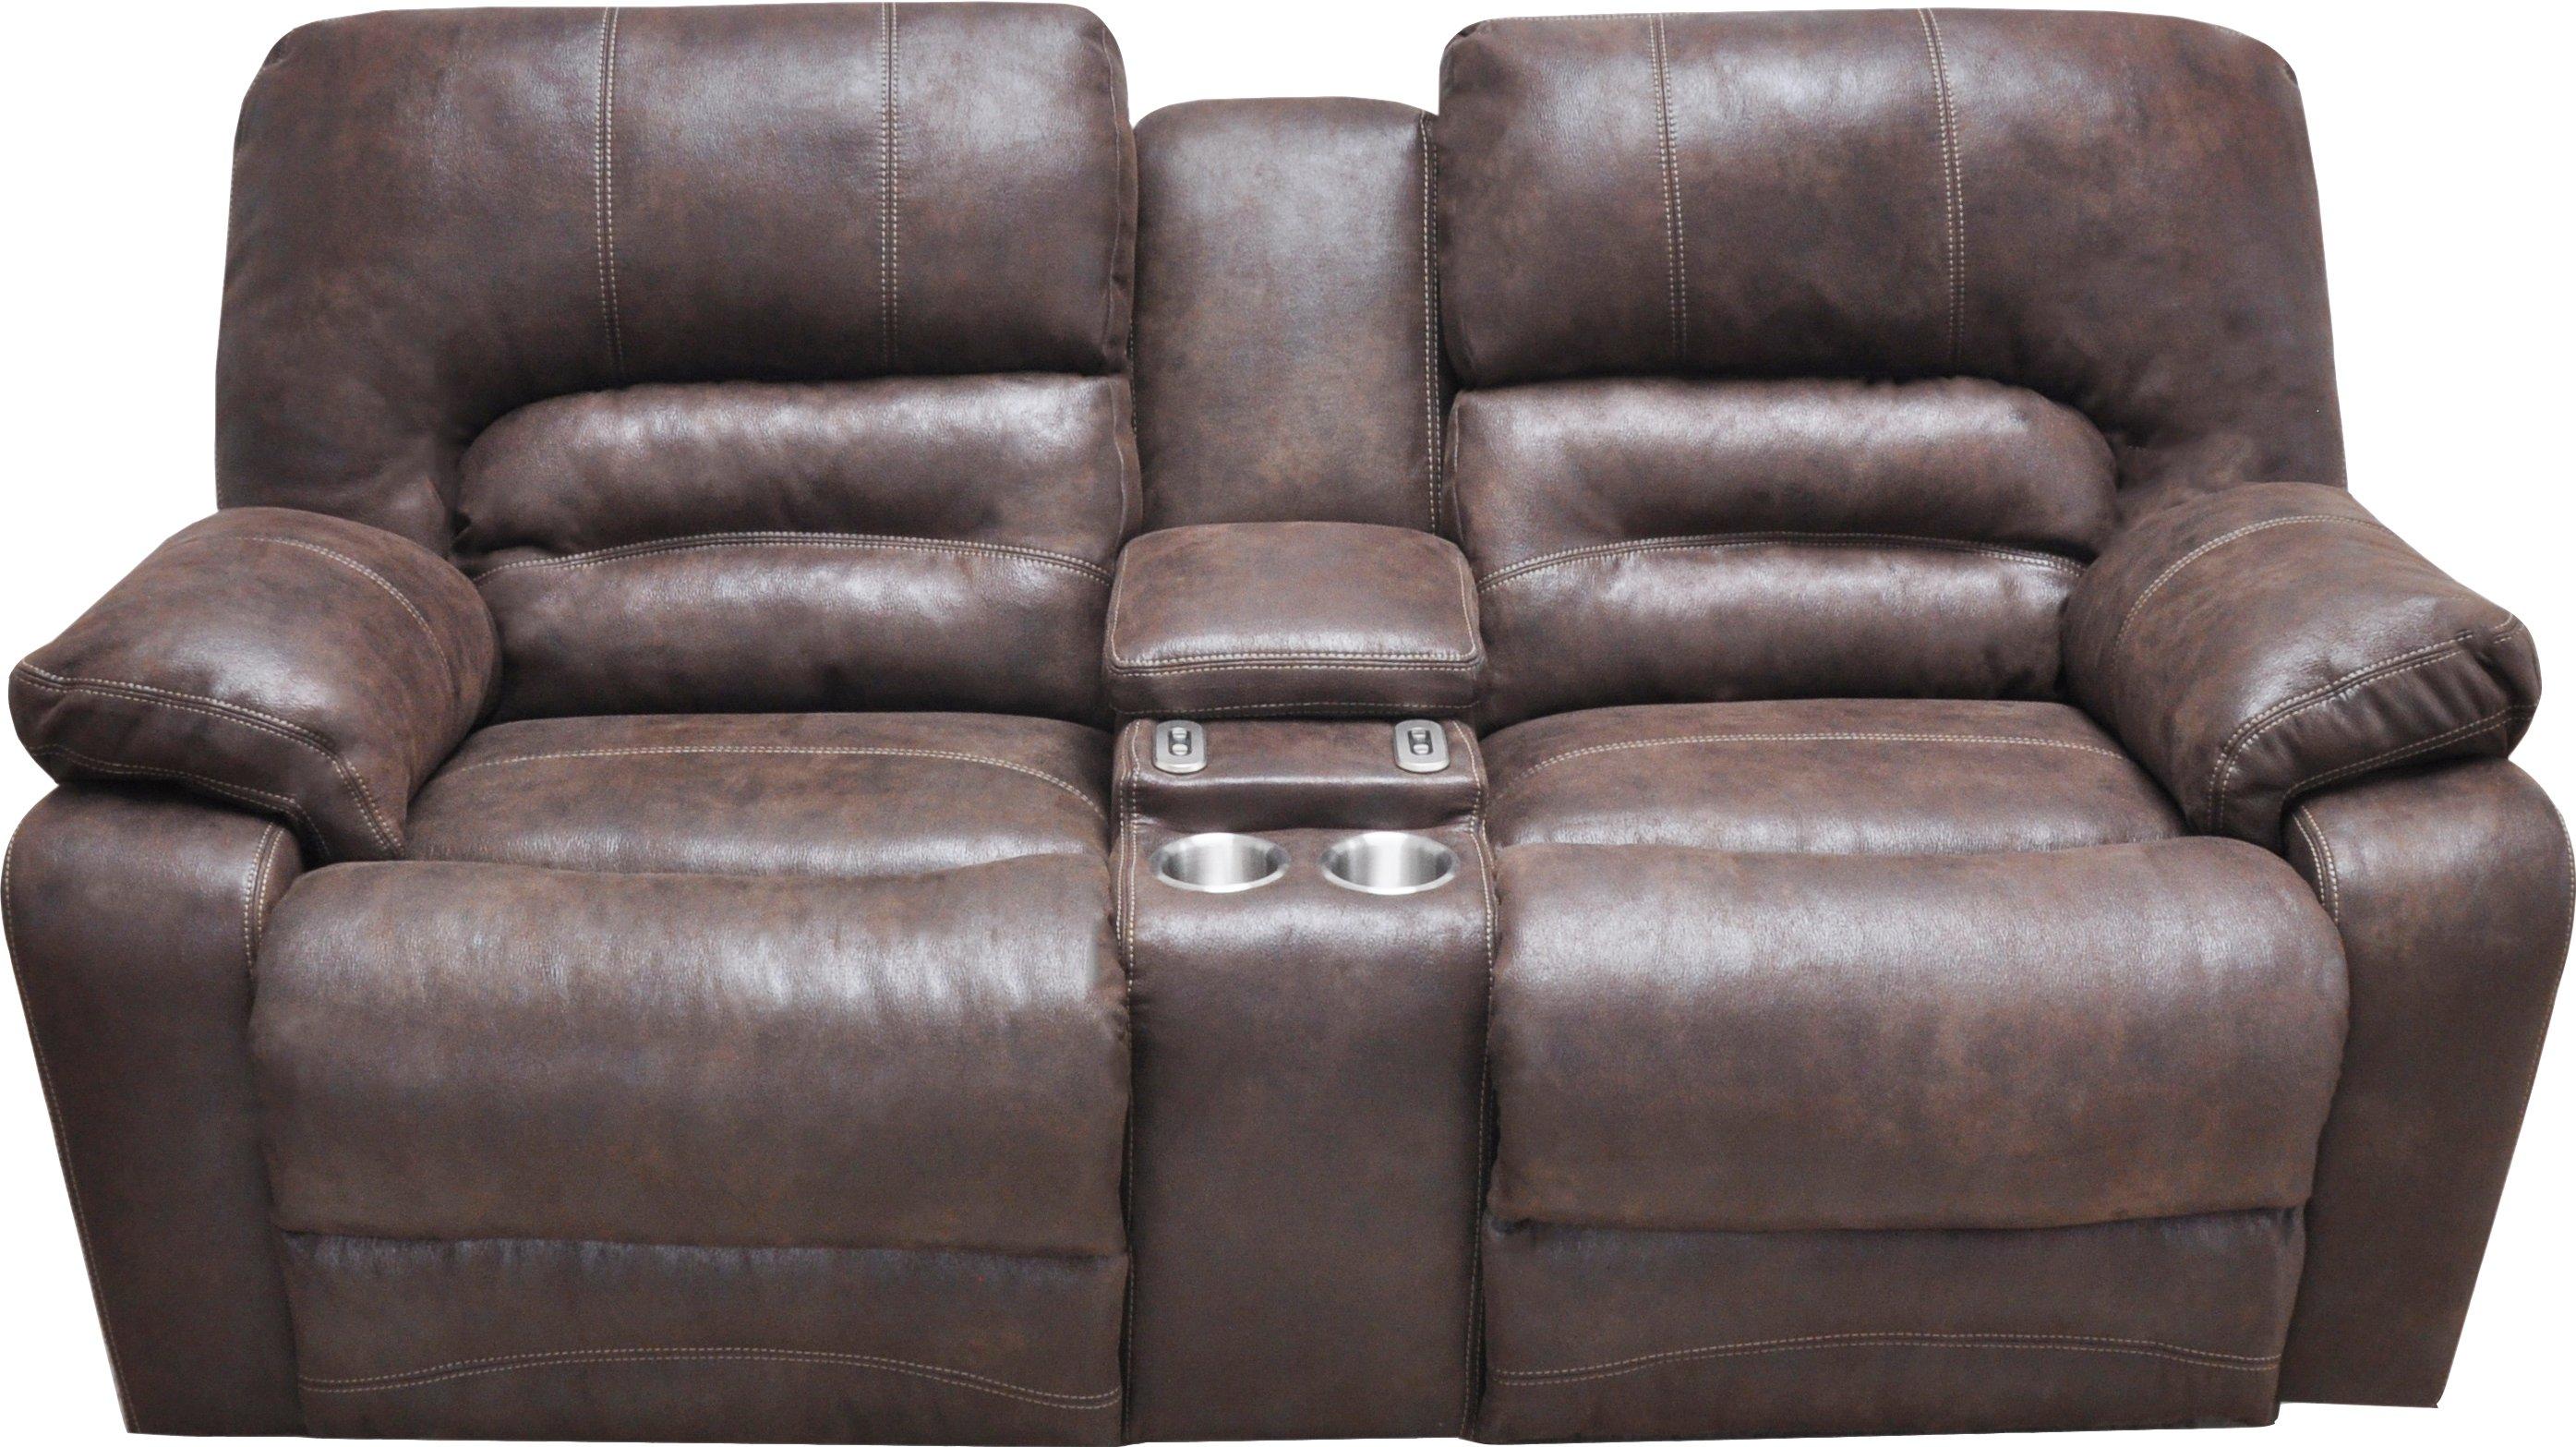 Chocolate Brown Microfiber Power Reclining Sofa Loveseat